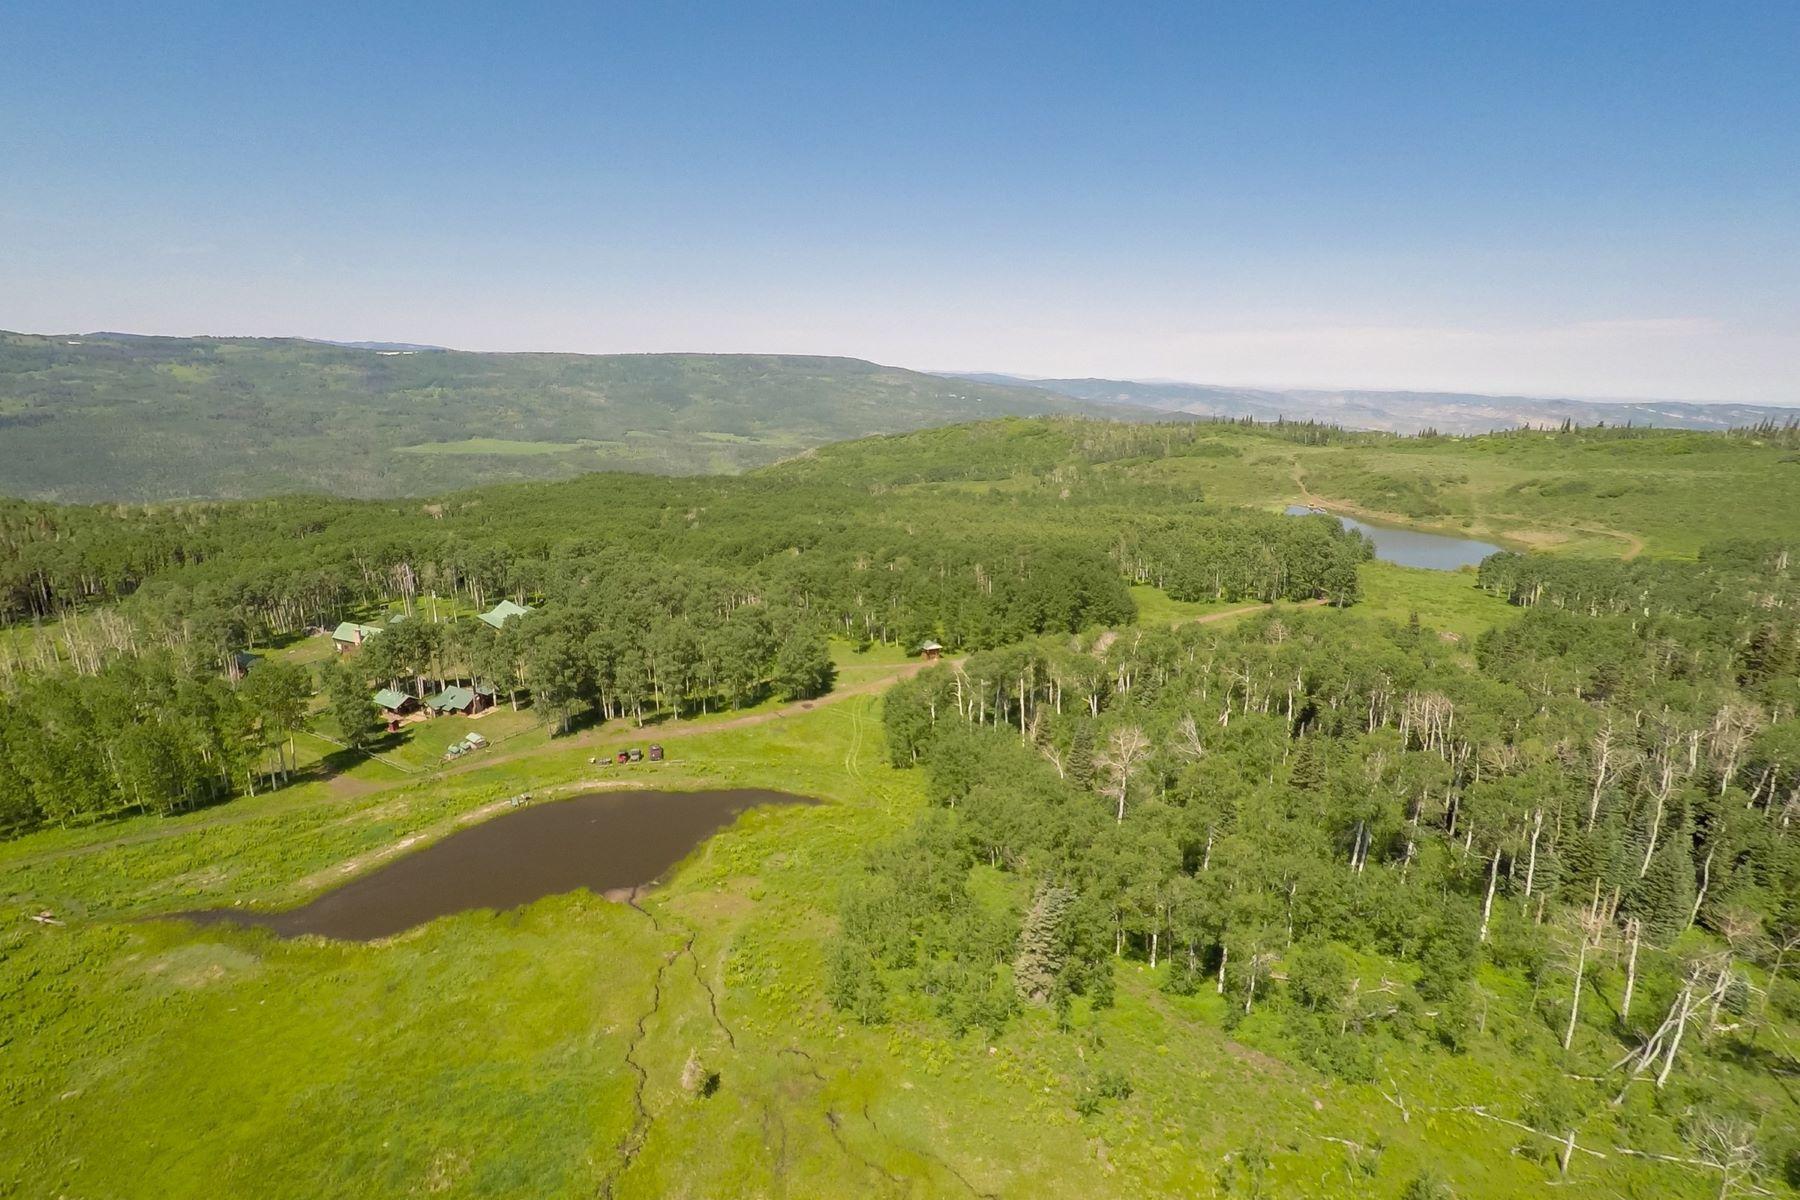 Fattoria / ranch / campagna per Vendita alle ore Dunckley Peak Ranch 10005 CR 29 Hayden, Colorado, 81639 Stati Uniti